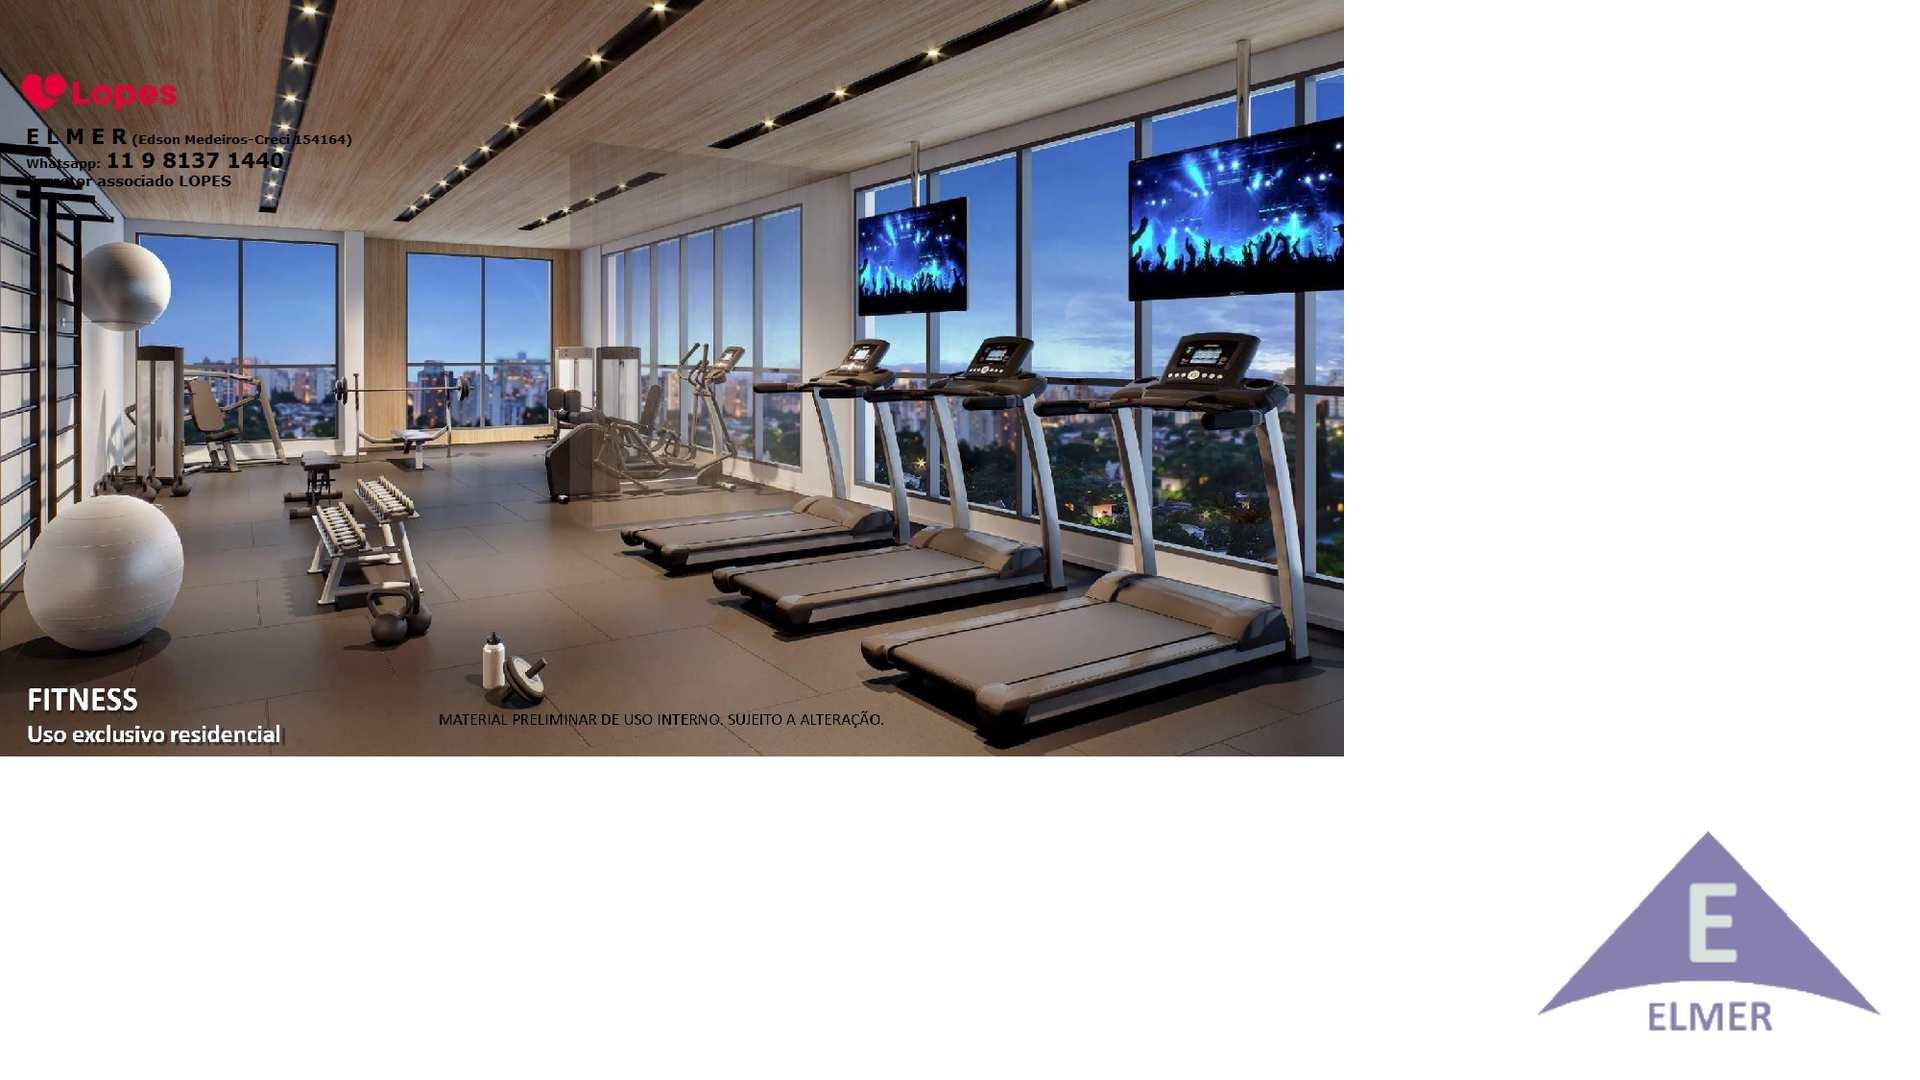 3 - Fitness - Haus Mitre -Campo-Belo - Elmer